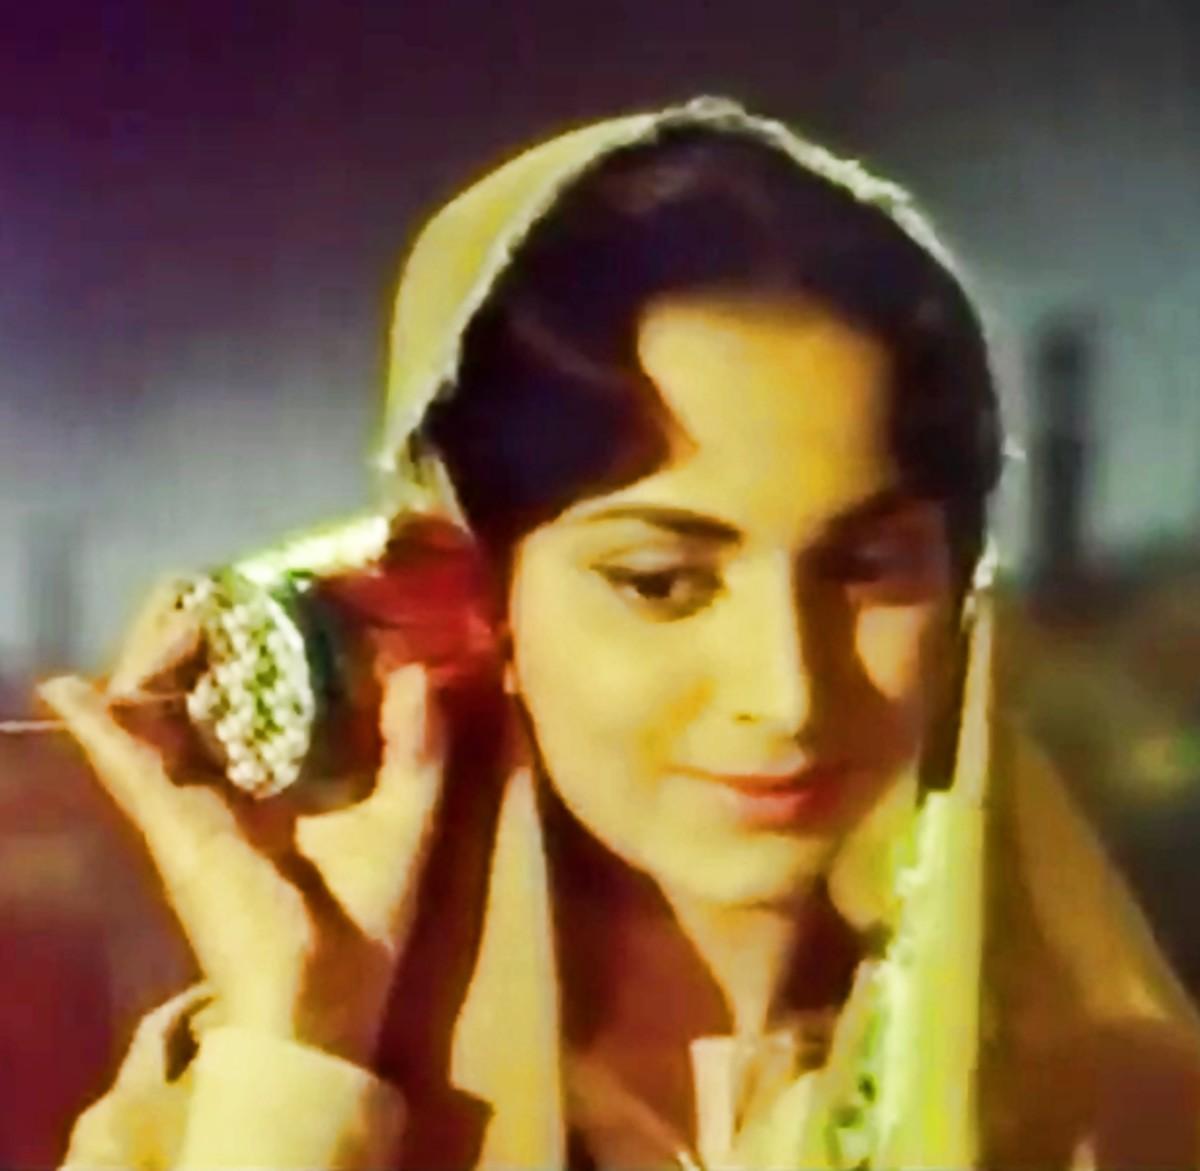 Another popular mainstream Bollywood number based on Raag Yaman Kalyan